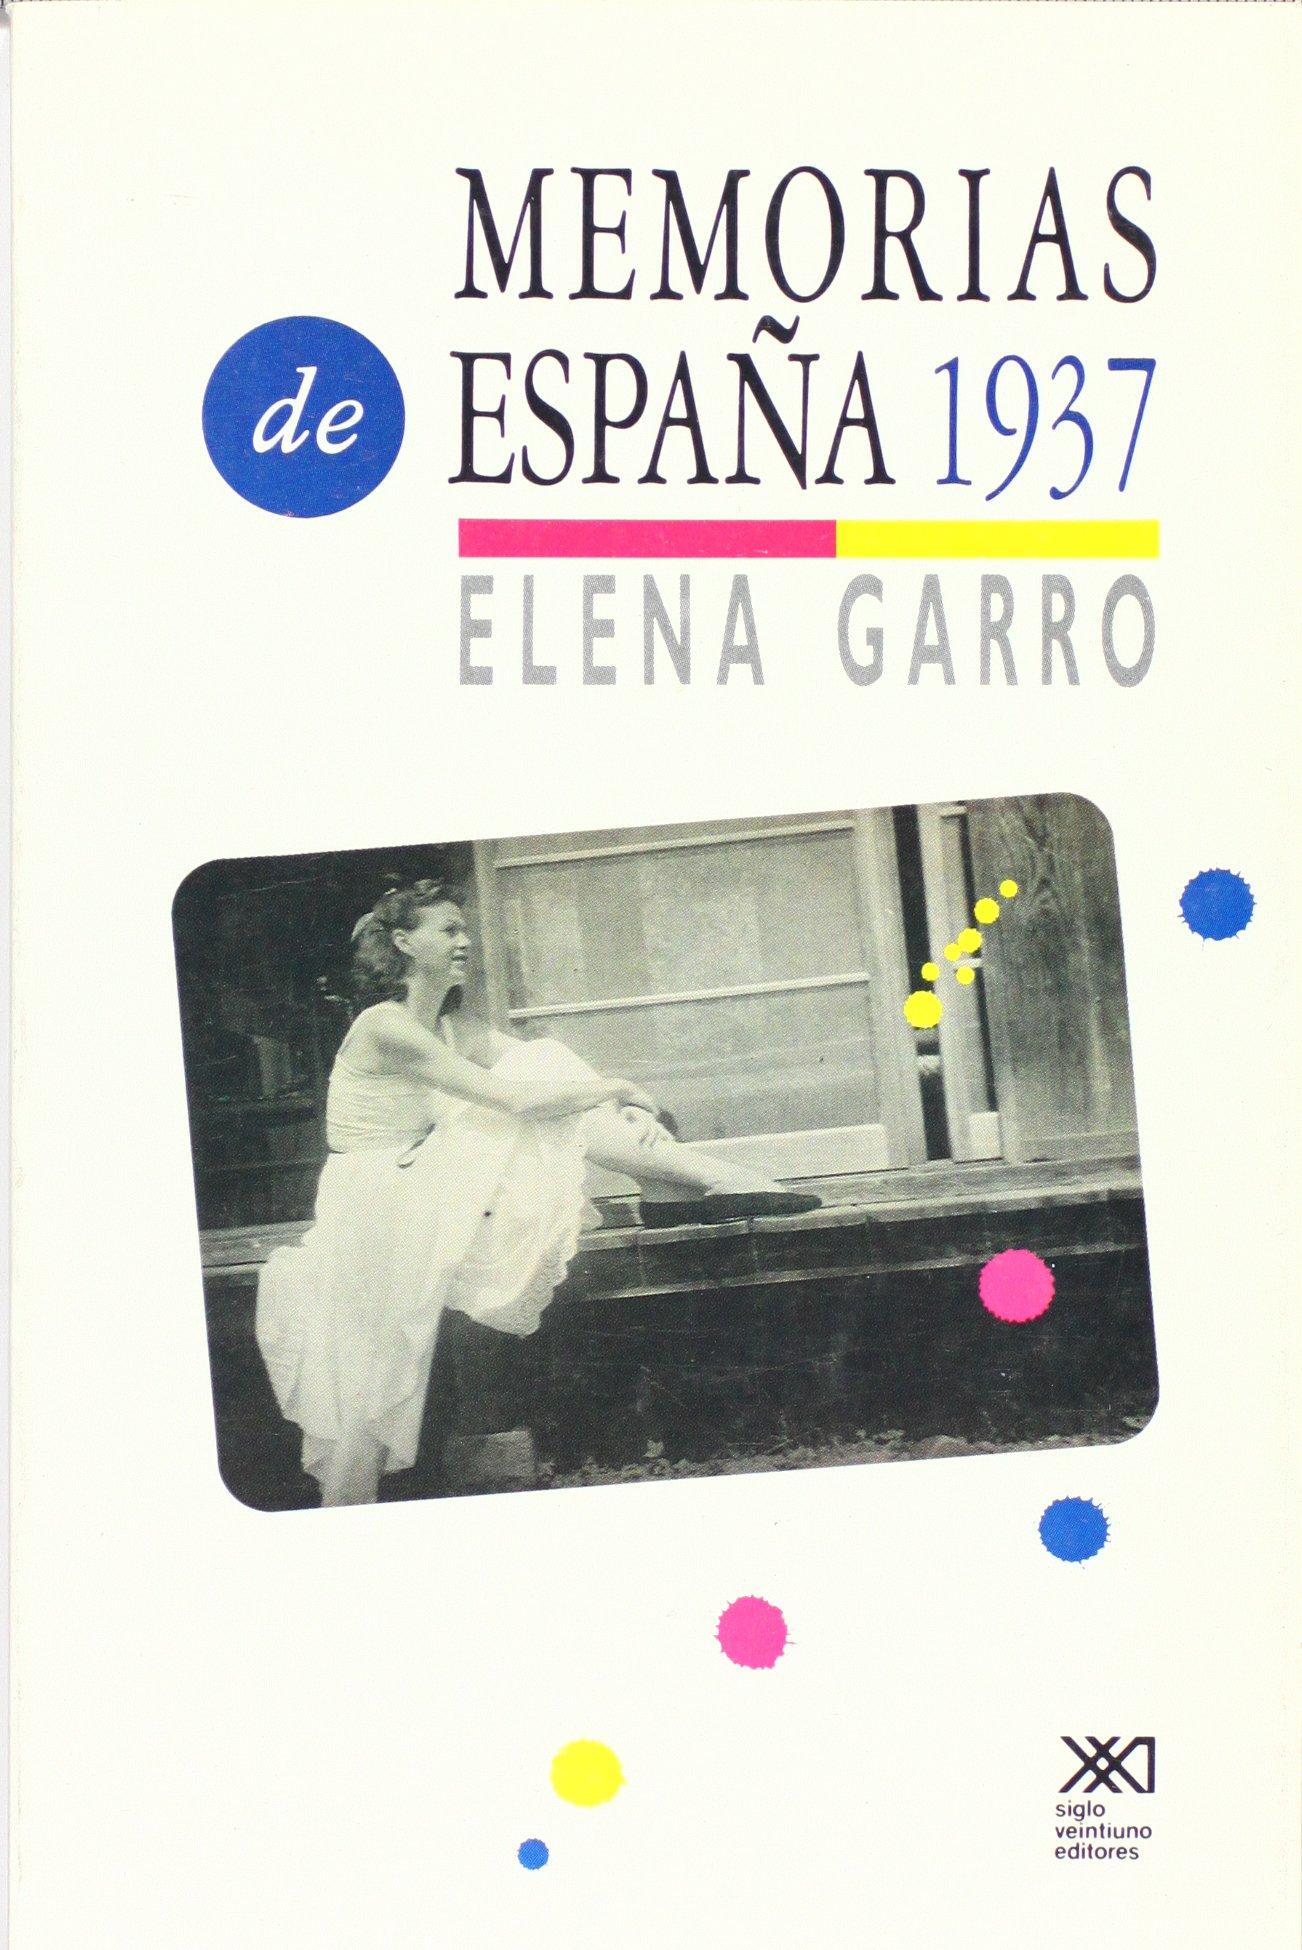 Memorias de España, 1937 (La creación literaria): Amazon.es: Garro ...